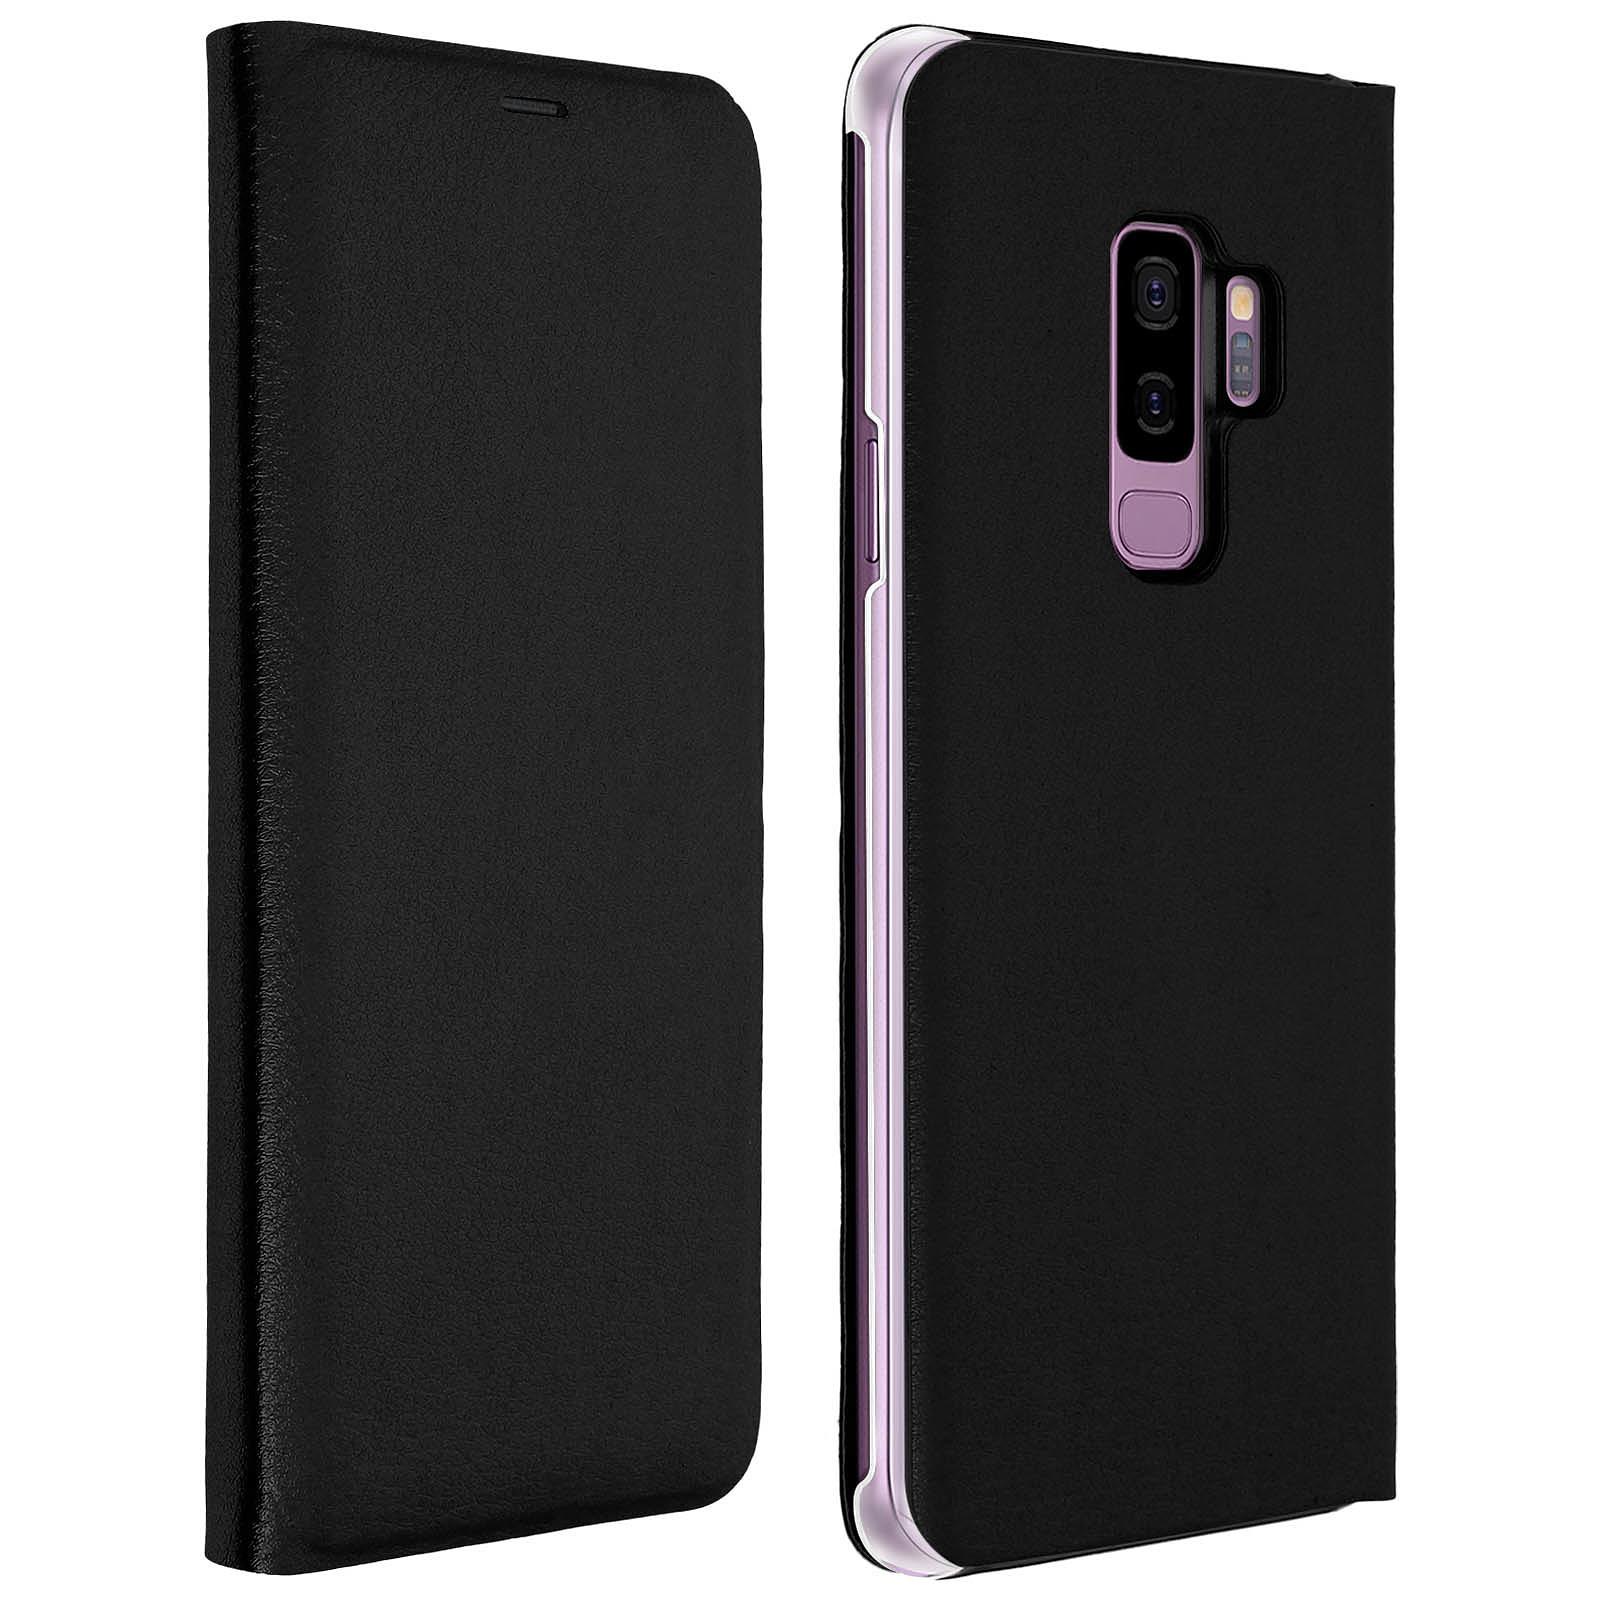 Avizar Etui folio Noir Éco-cuir pour Samsung Galaxy S9 Plus